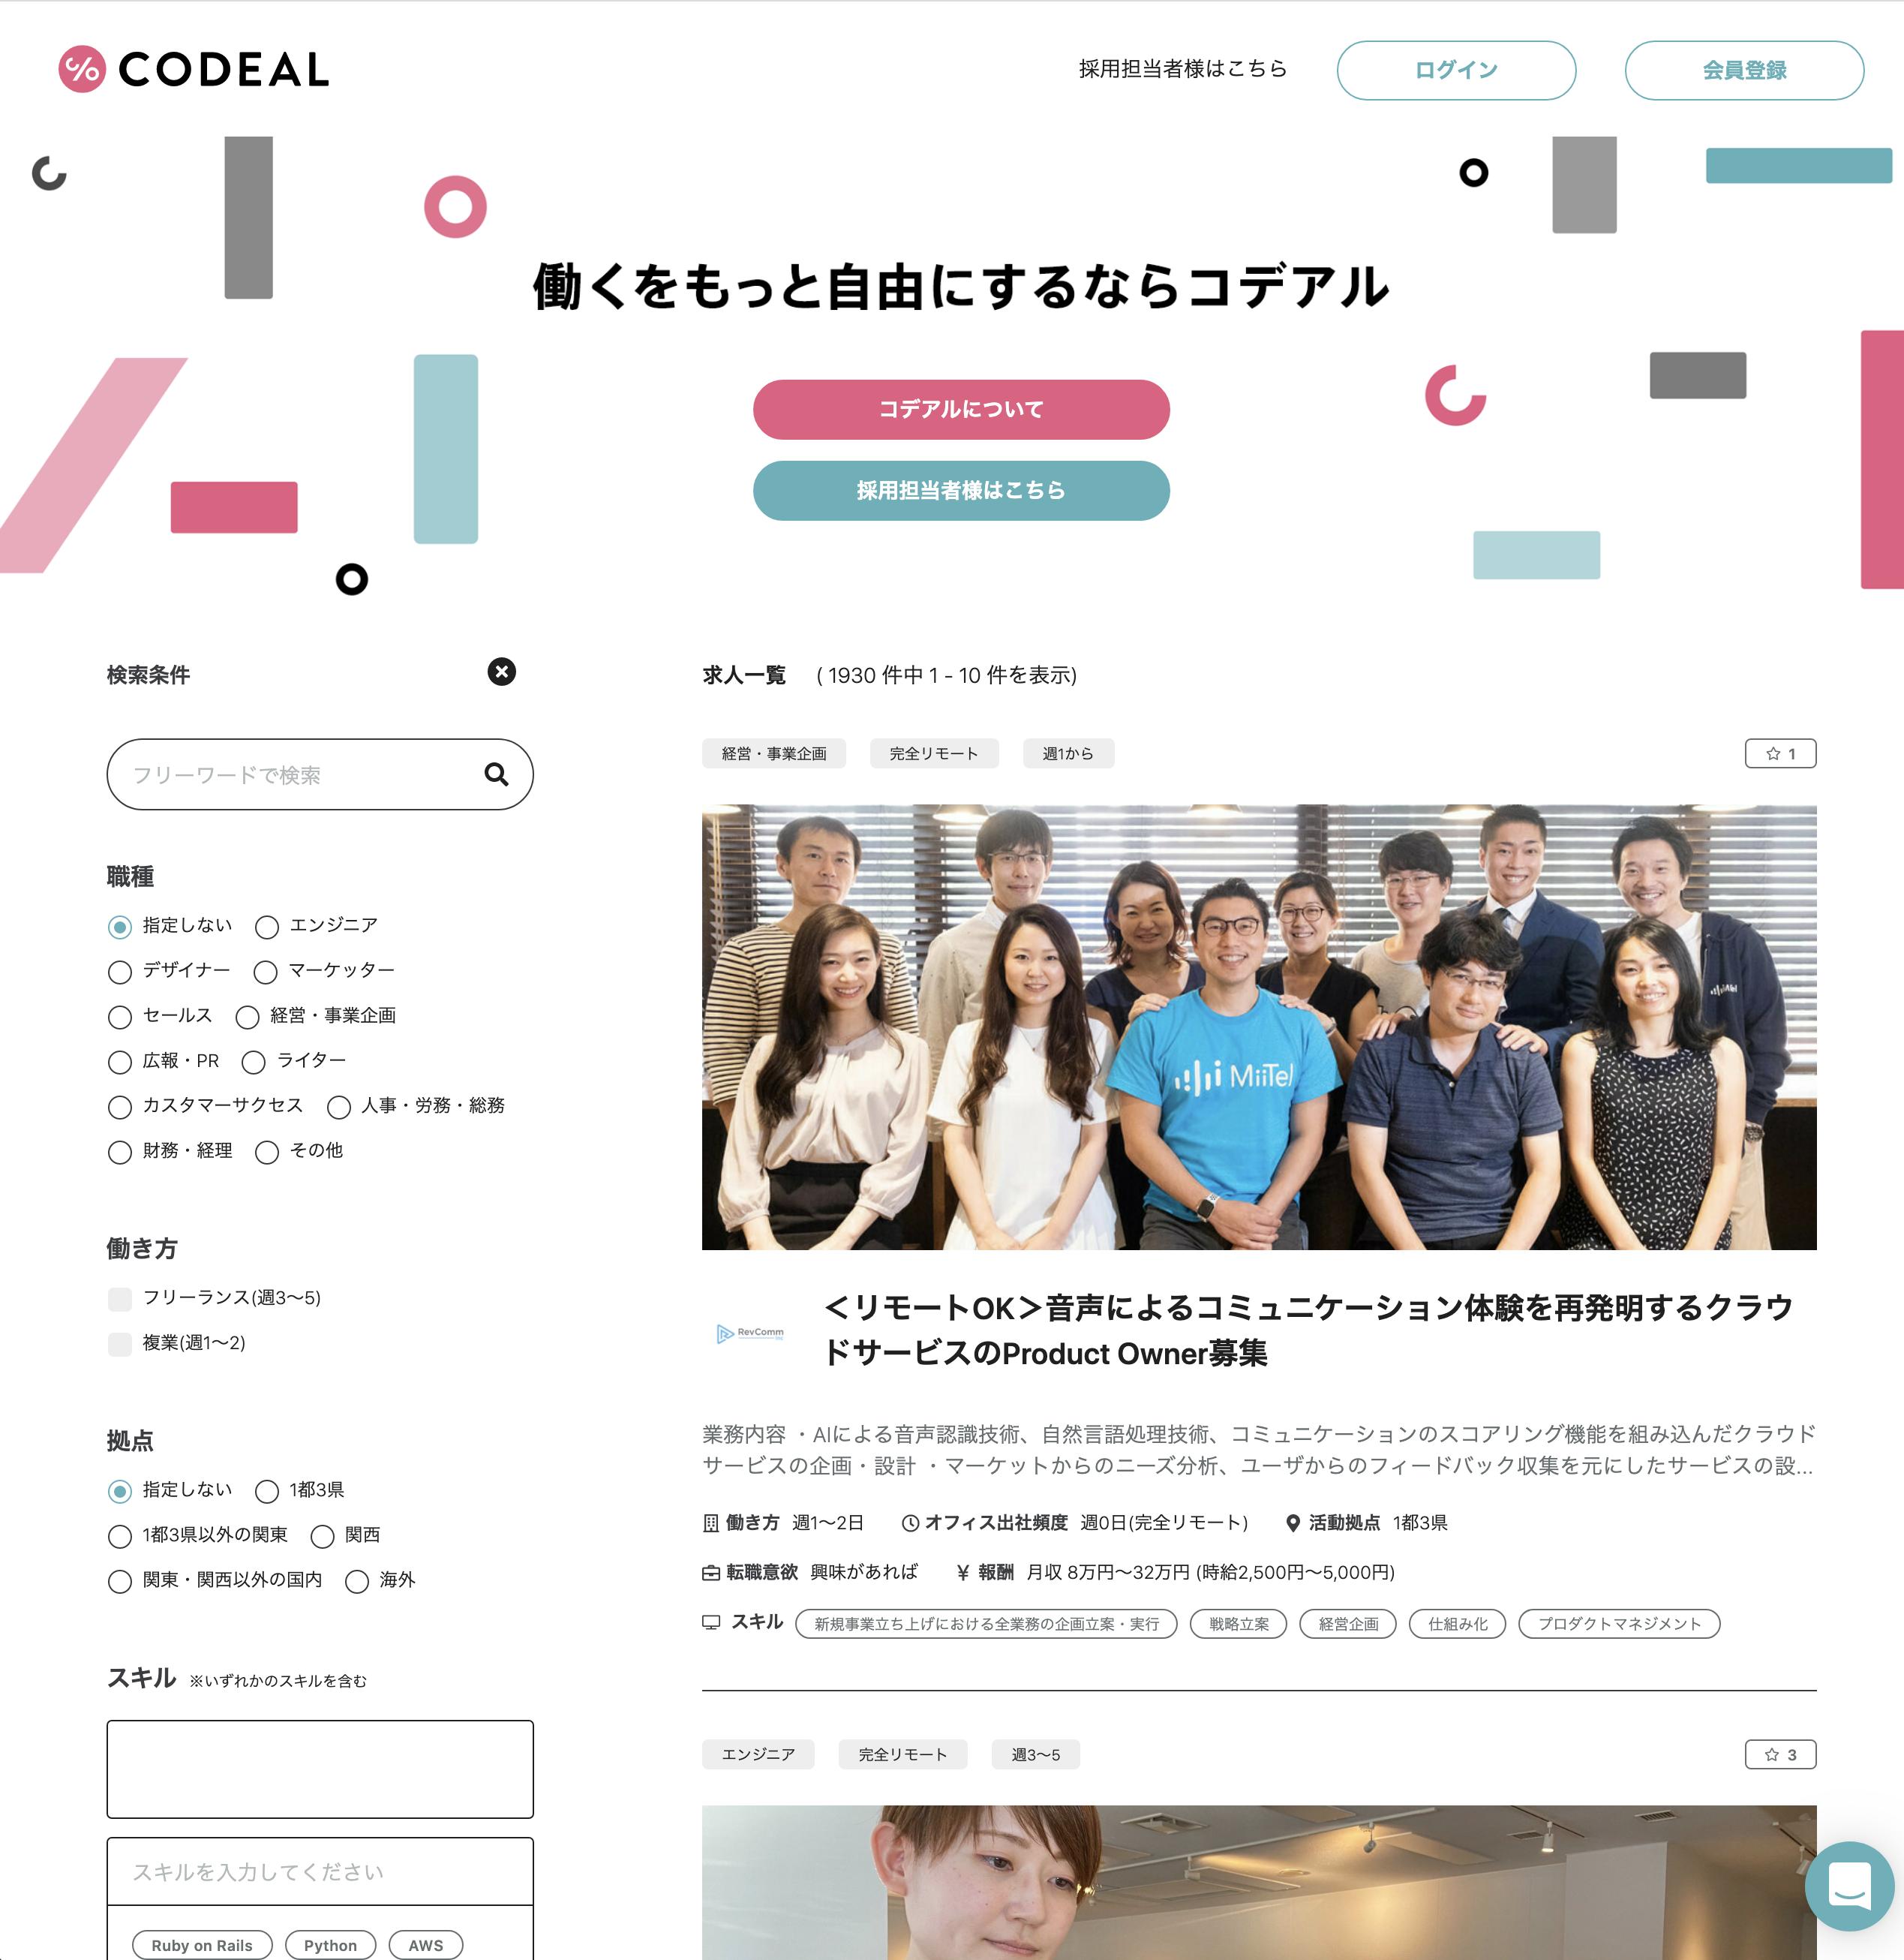 CODEALの公式サイトのスクリーンショット